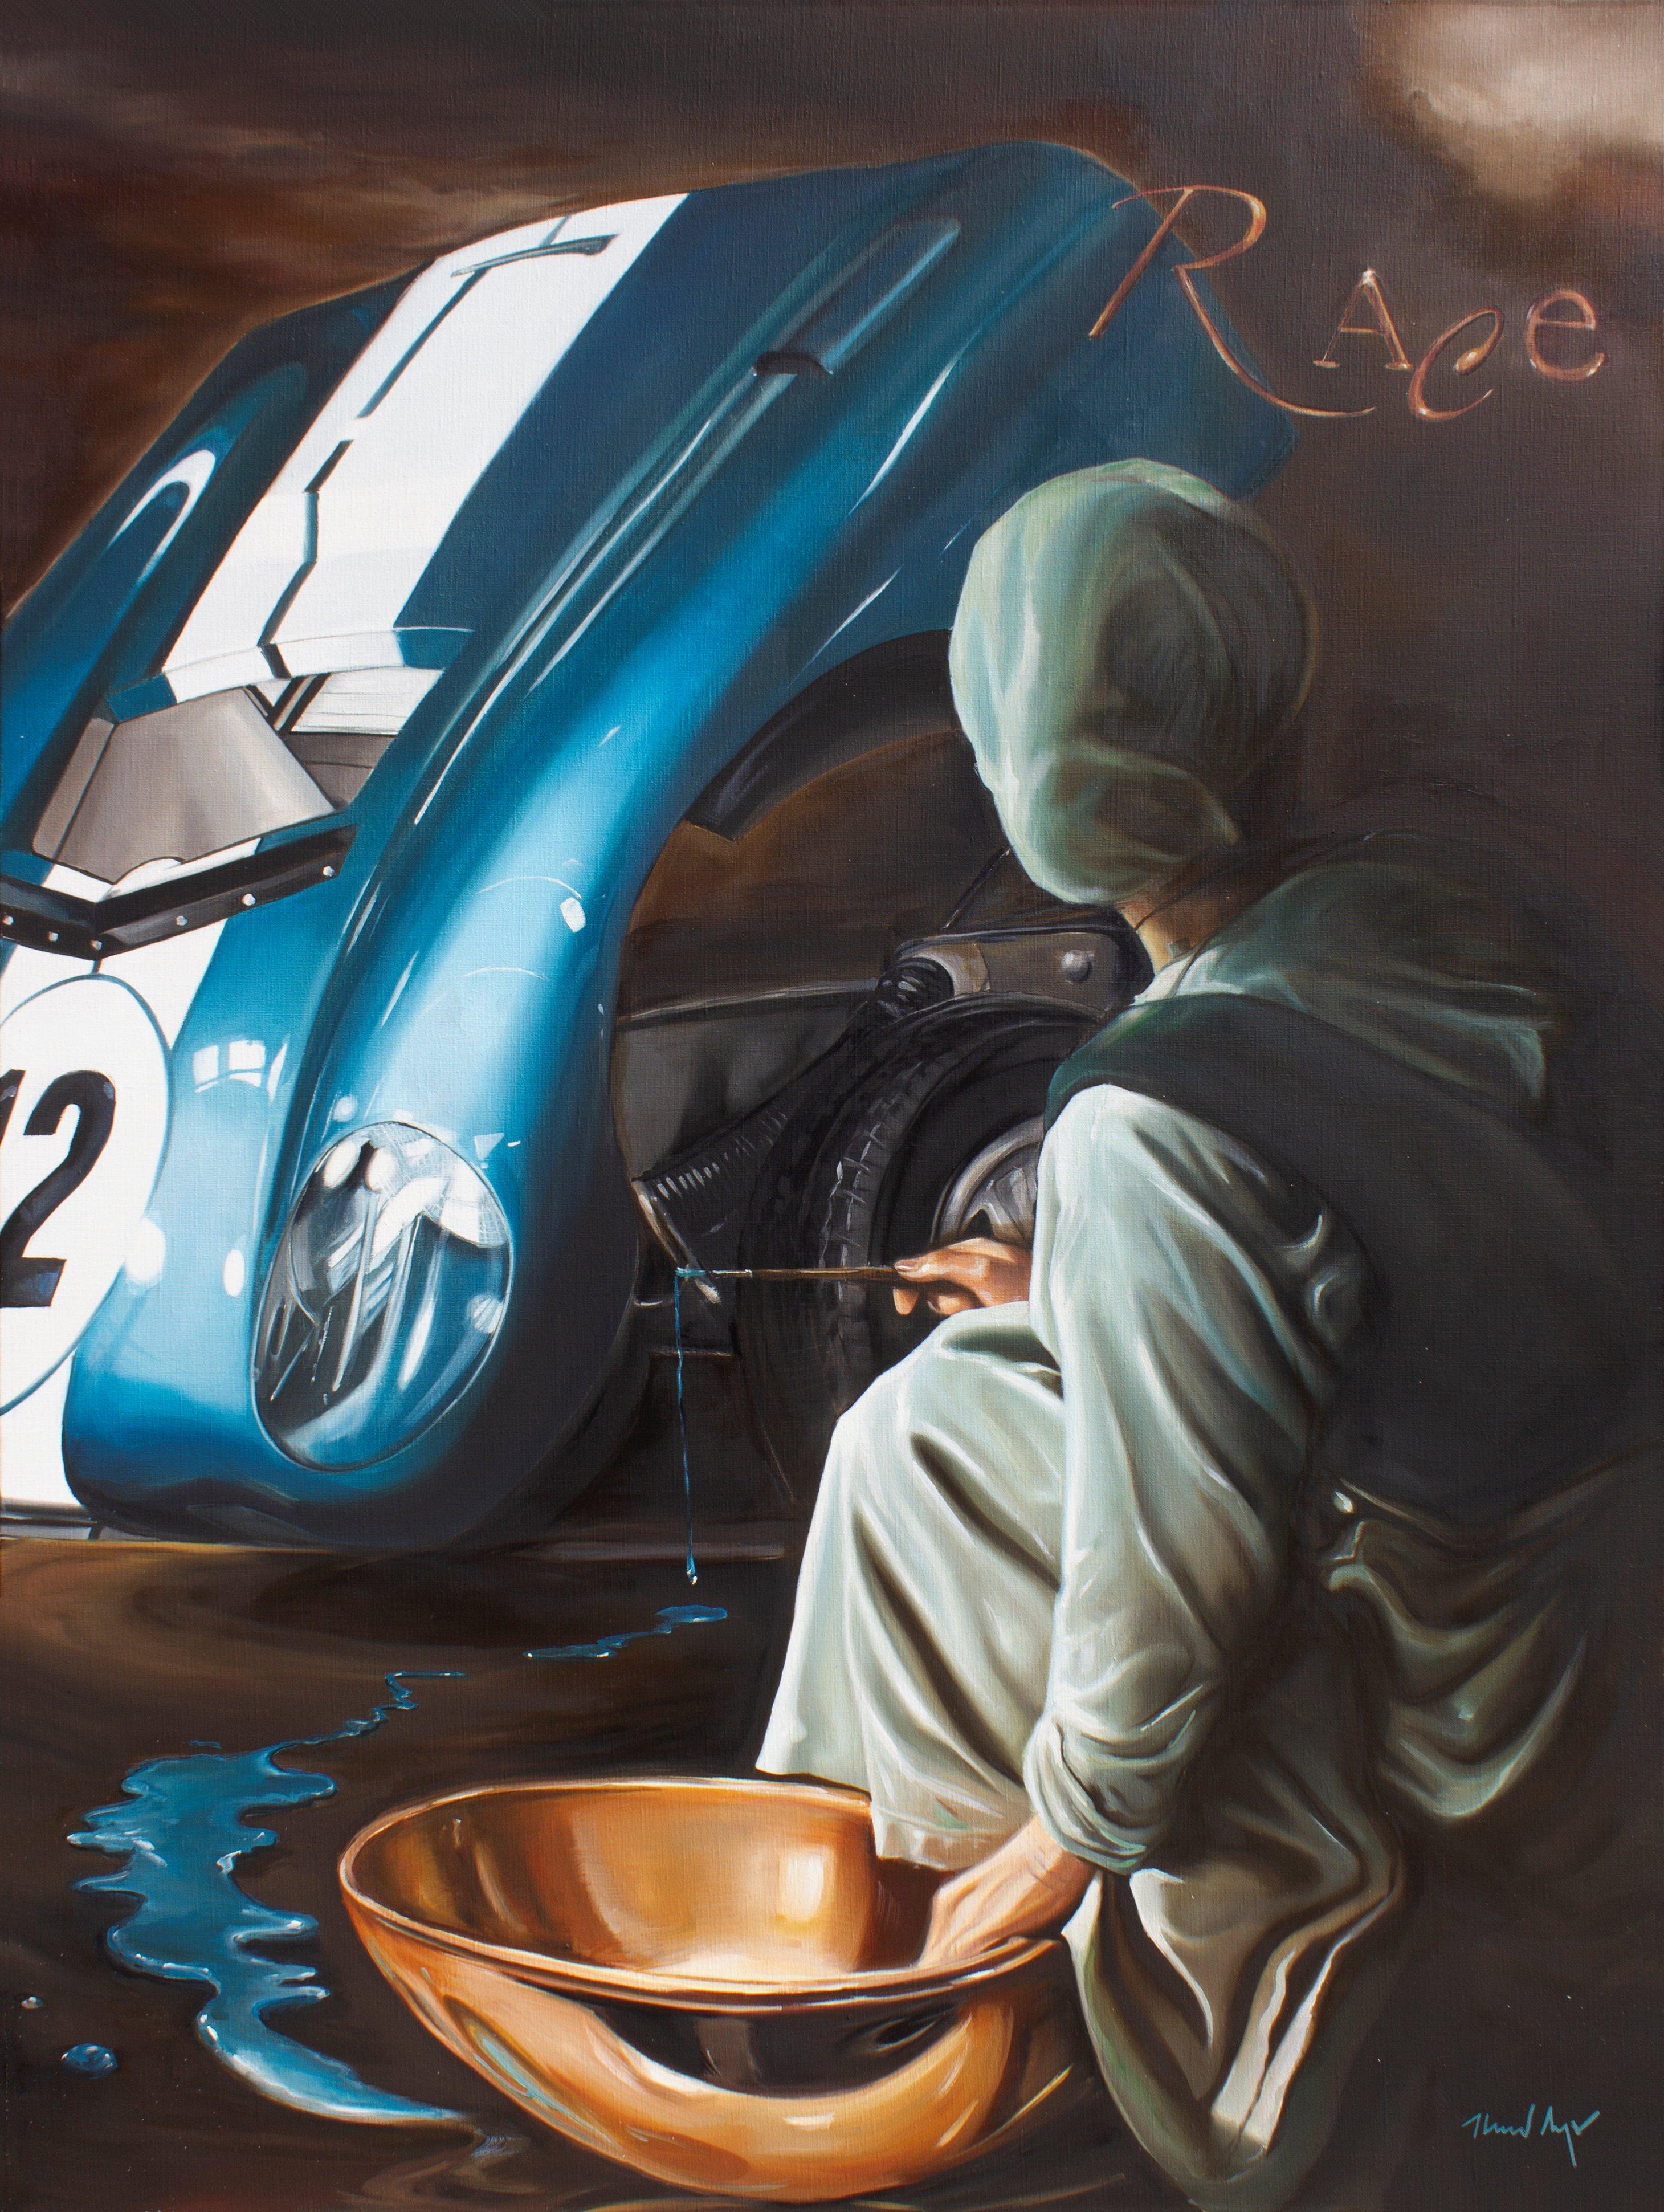 Race - framed 64.75 x 49 in